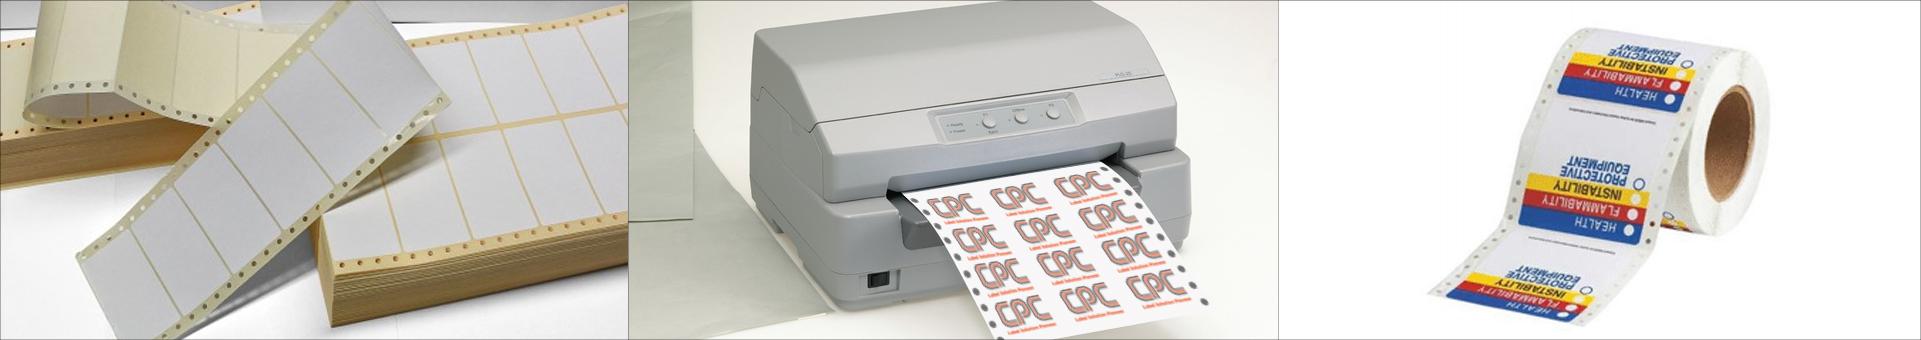 computer edp